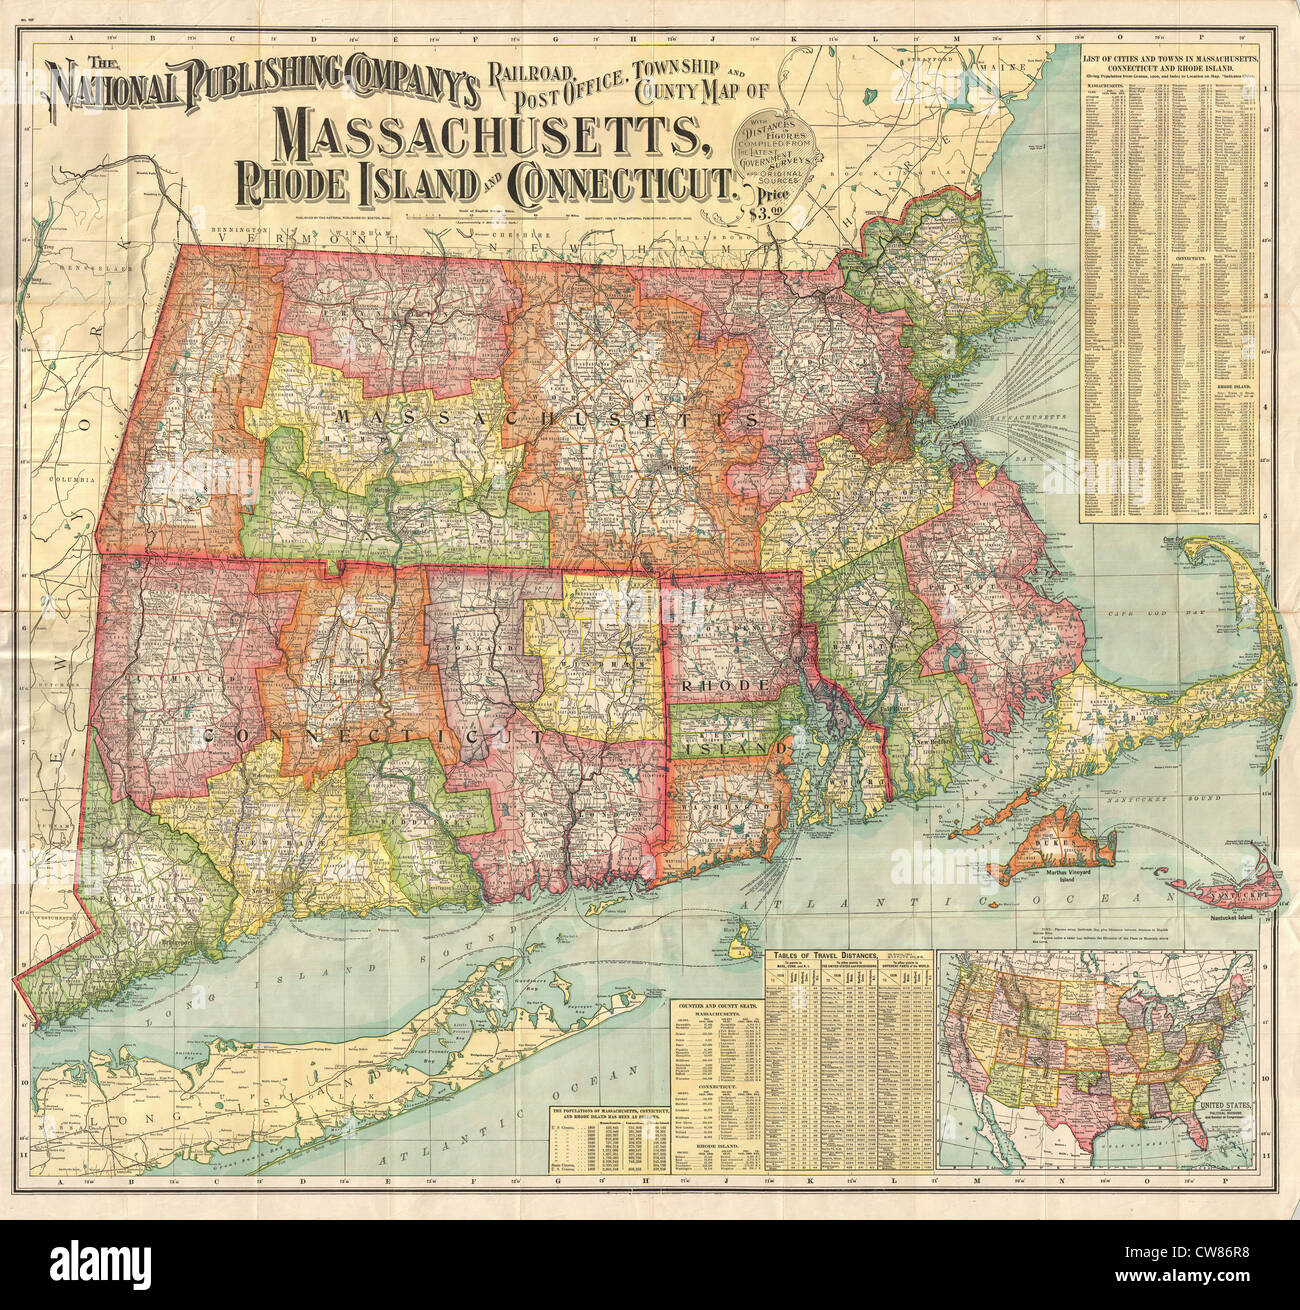 1900 National Publishing Railroad Map of Connecticut, Massachusetts ...